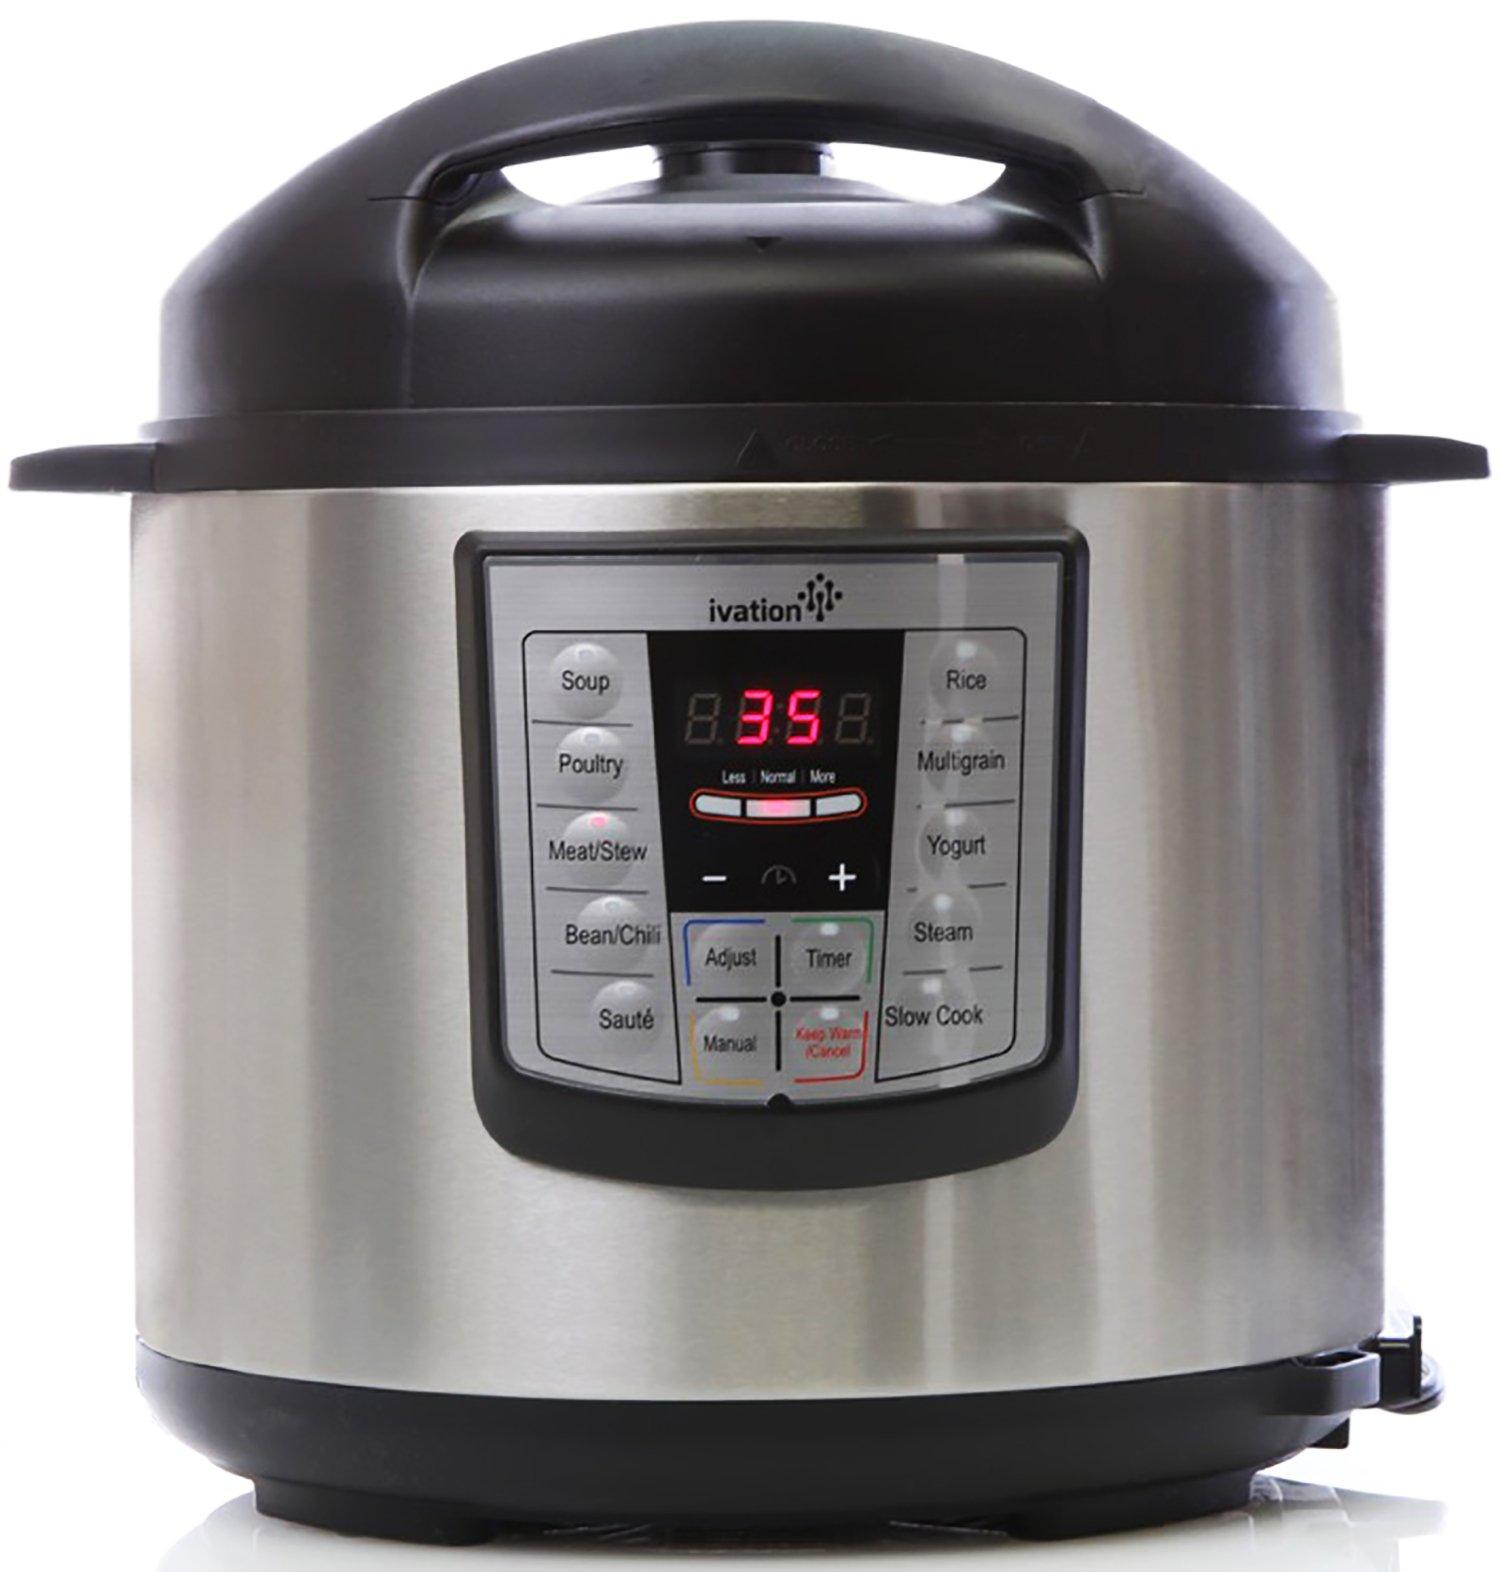 KitchenAid KMC4241CA Multi-Cooker